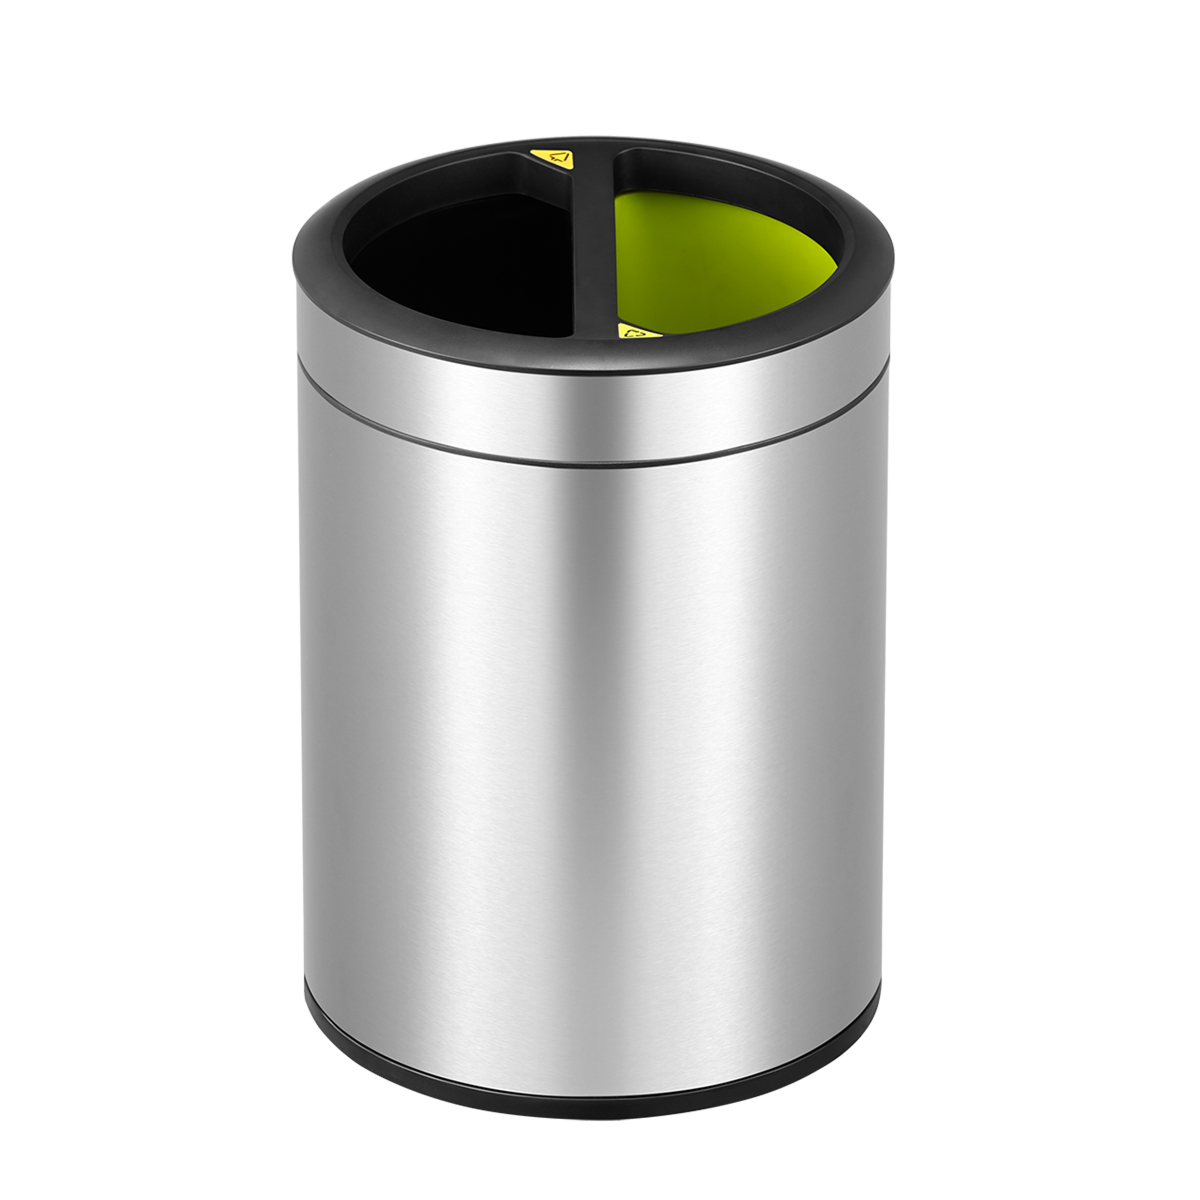 EKO Round Open Top Recycling Bin 10L